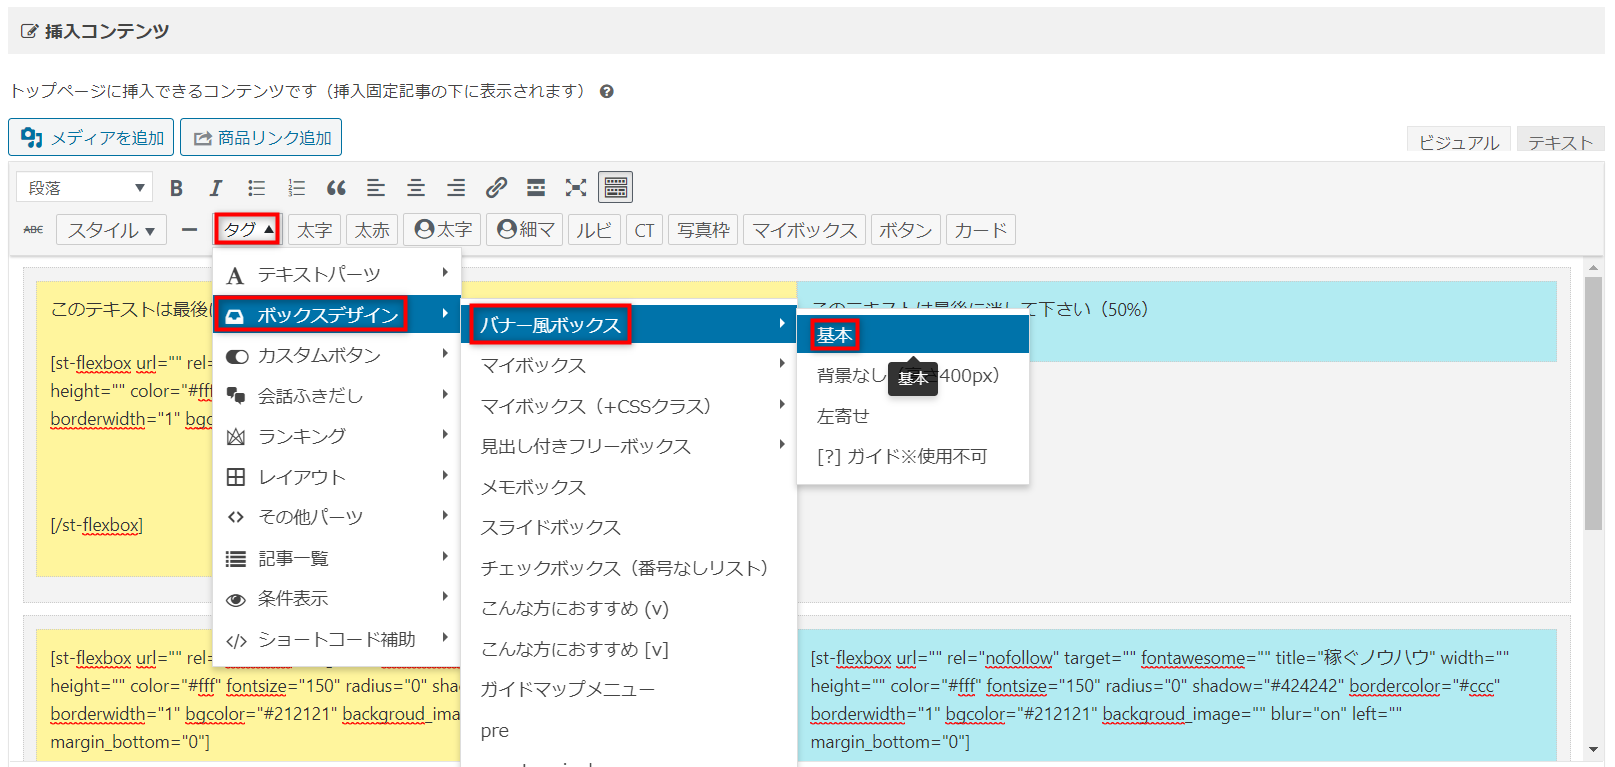 AFFINGER5の管理画面の挿入コンテンツ枠の画像